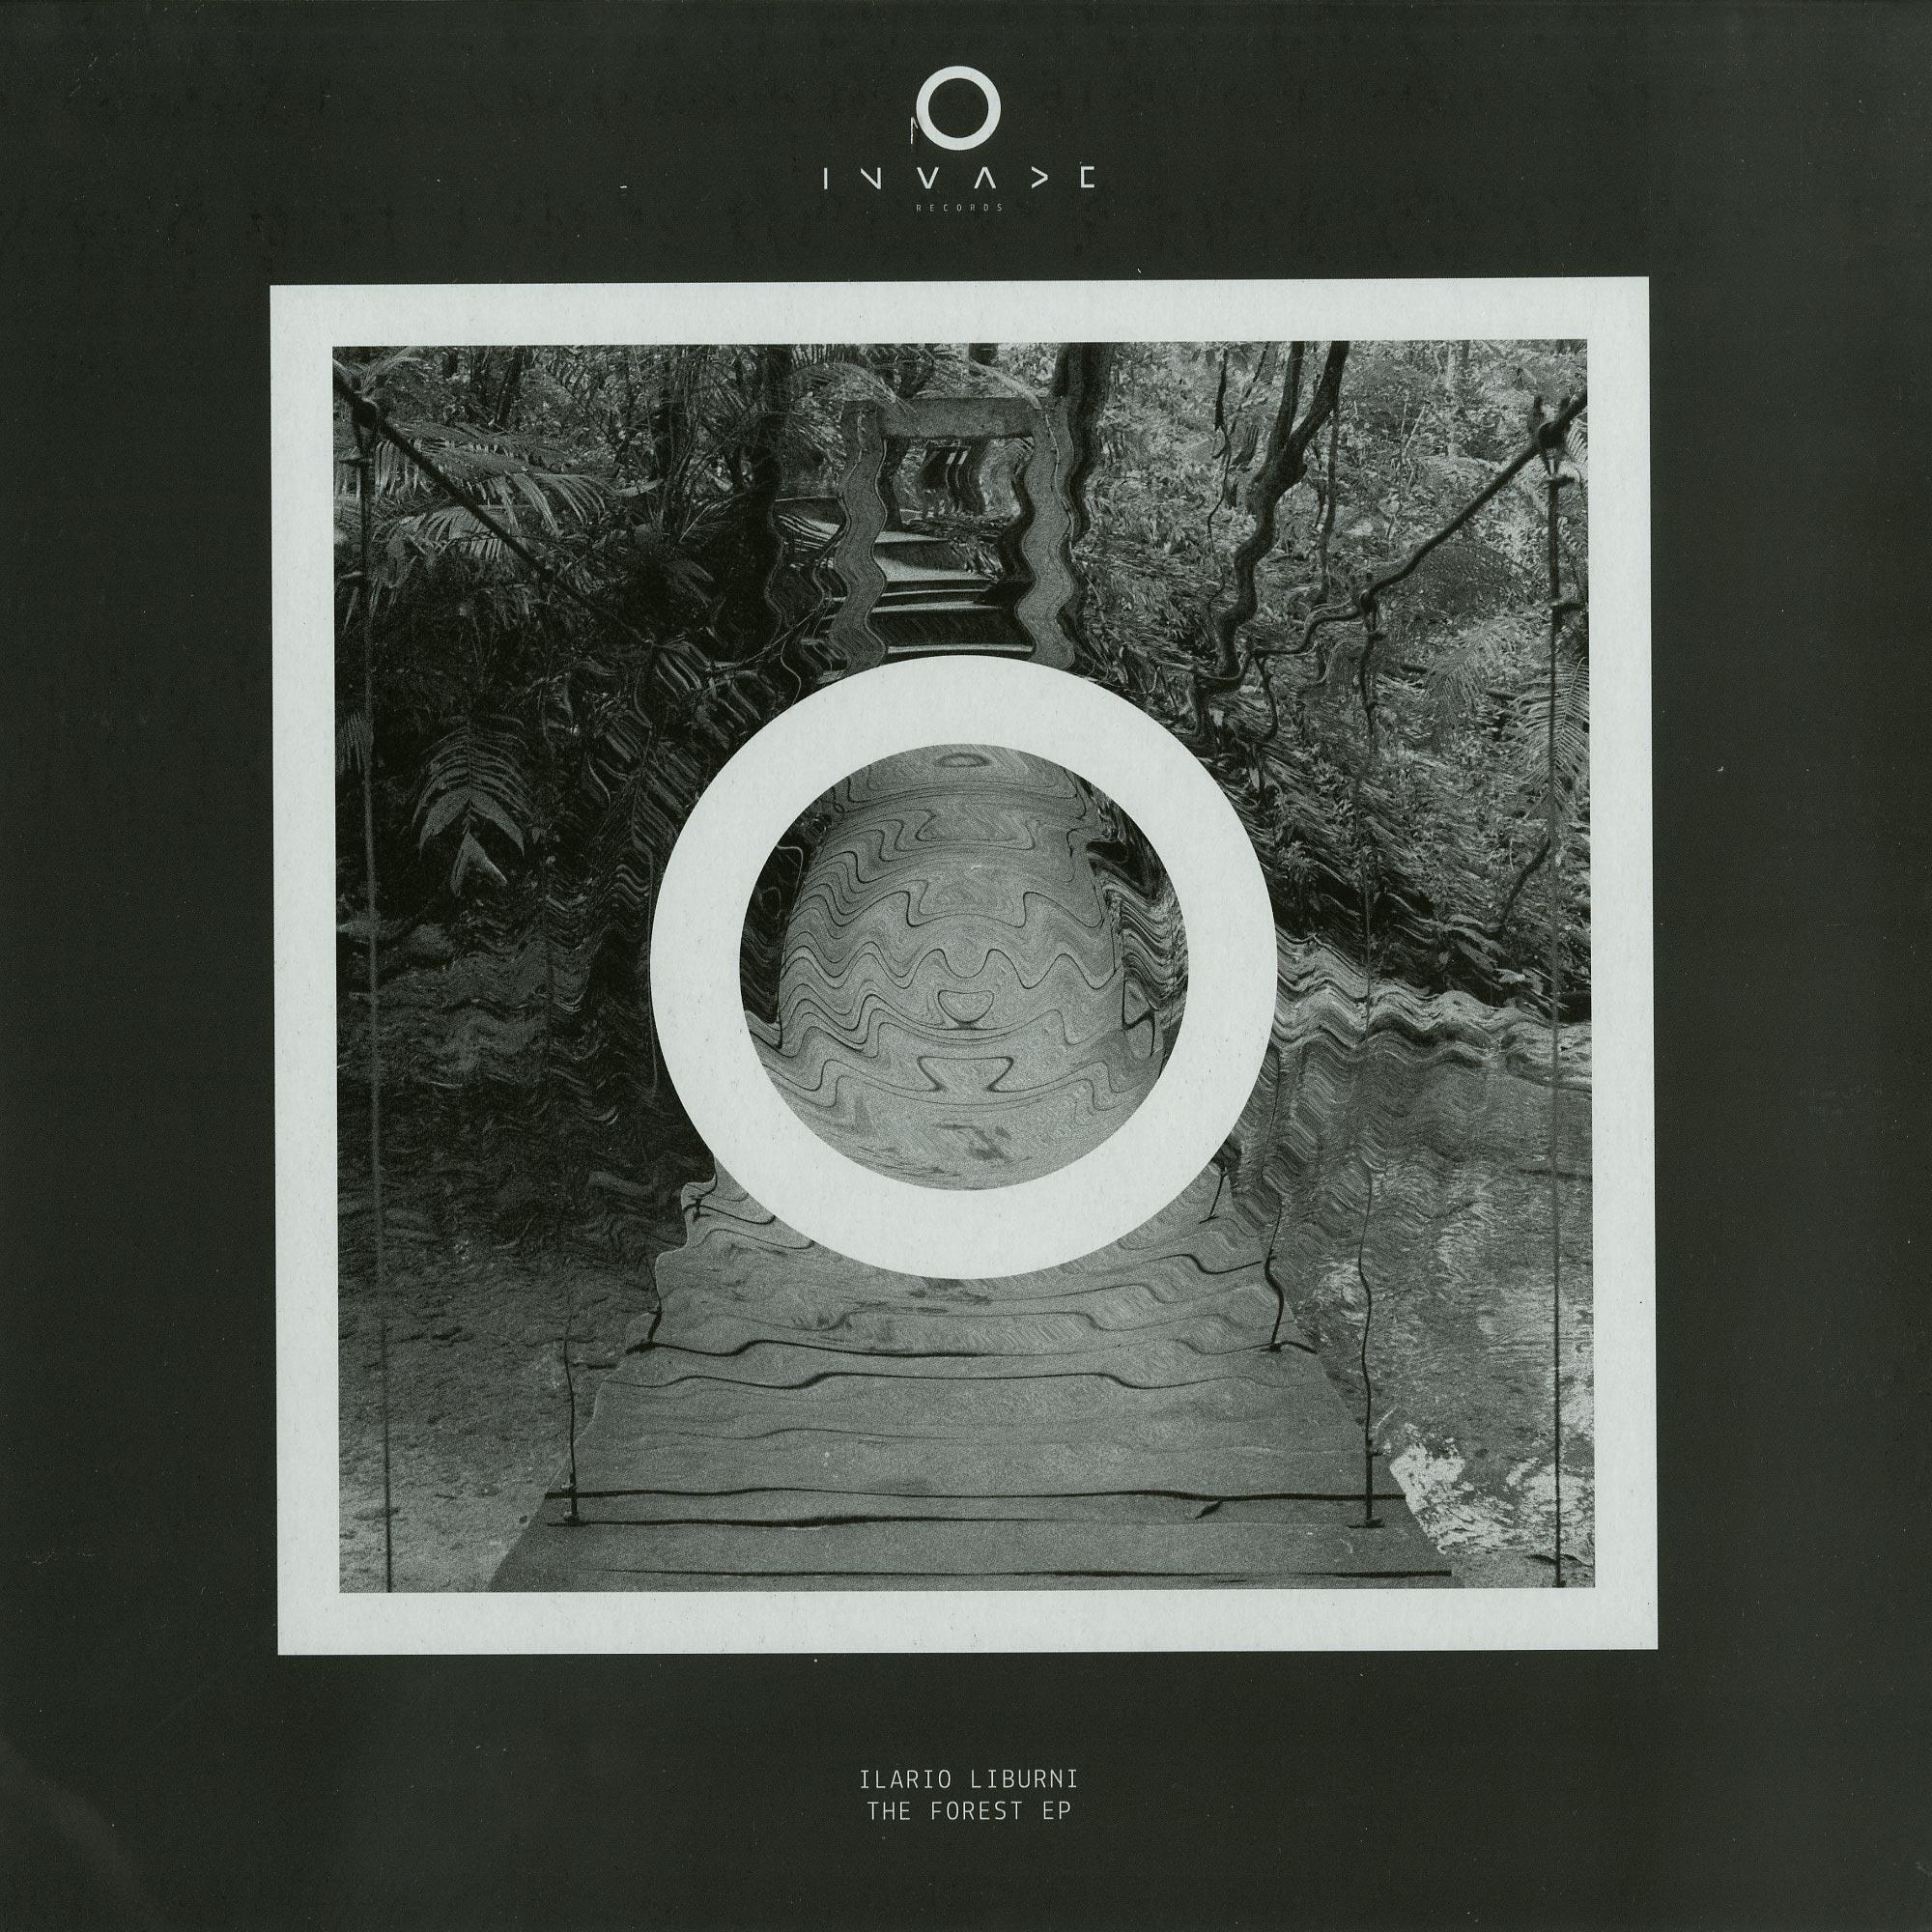 Ilario Liburni - THE FOREST EP